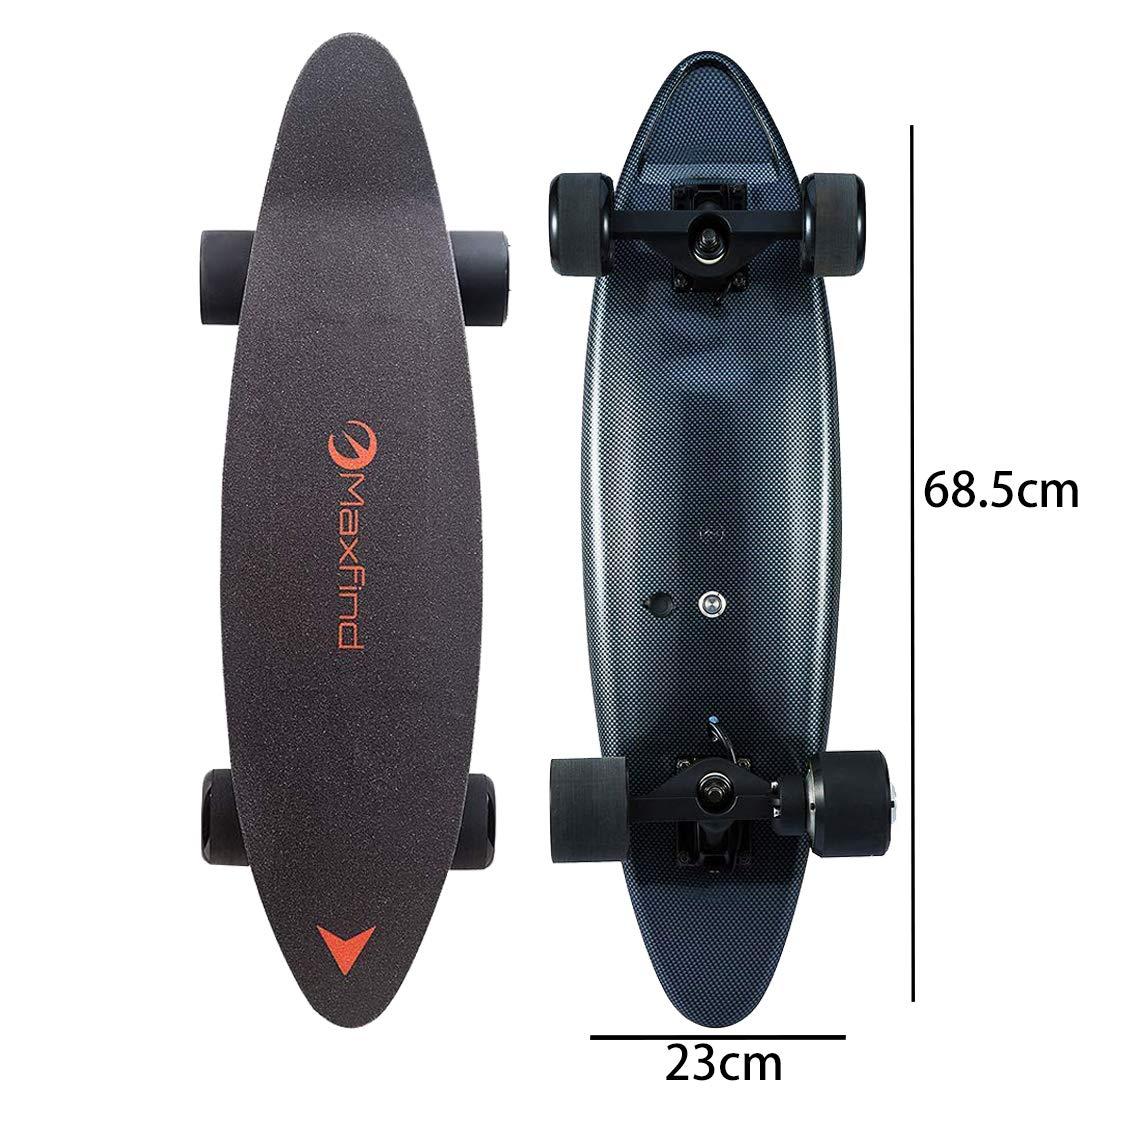 Maxfind 27'' 14 mph 500 w Single Motor Electric Skateboard with Wireless Remote Control (Black) (Black)